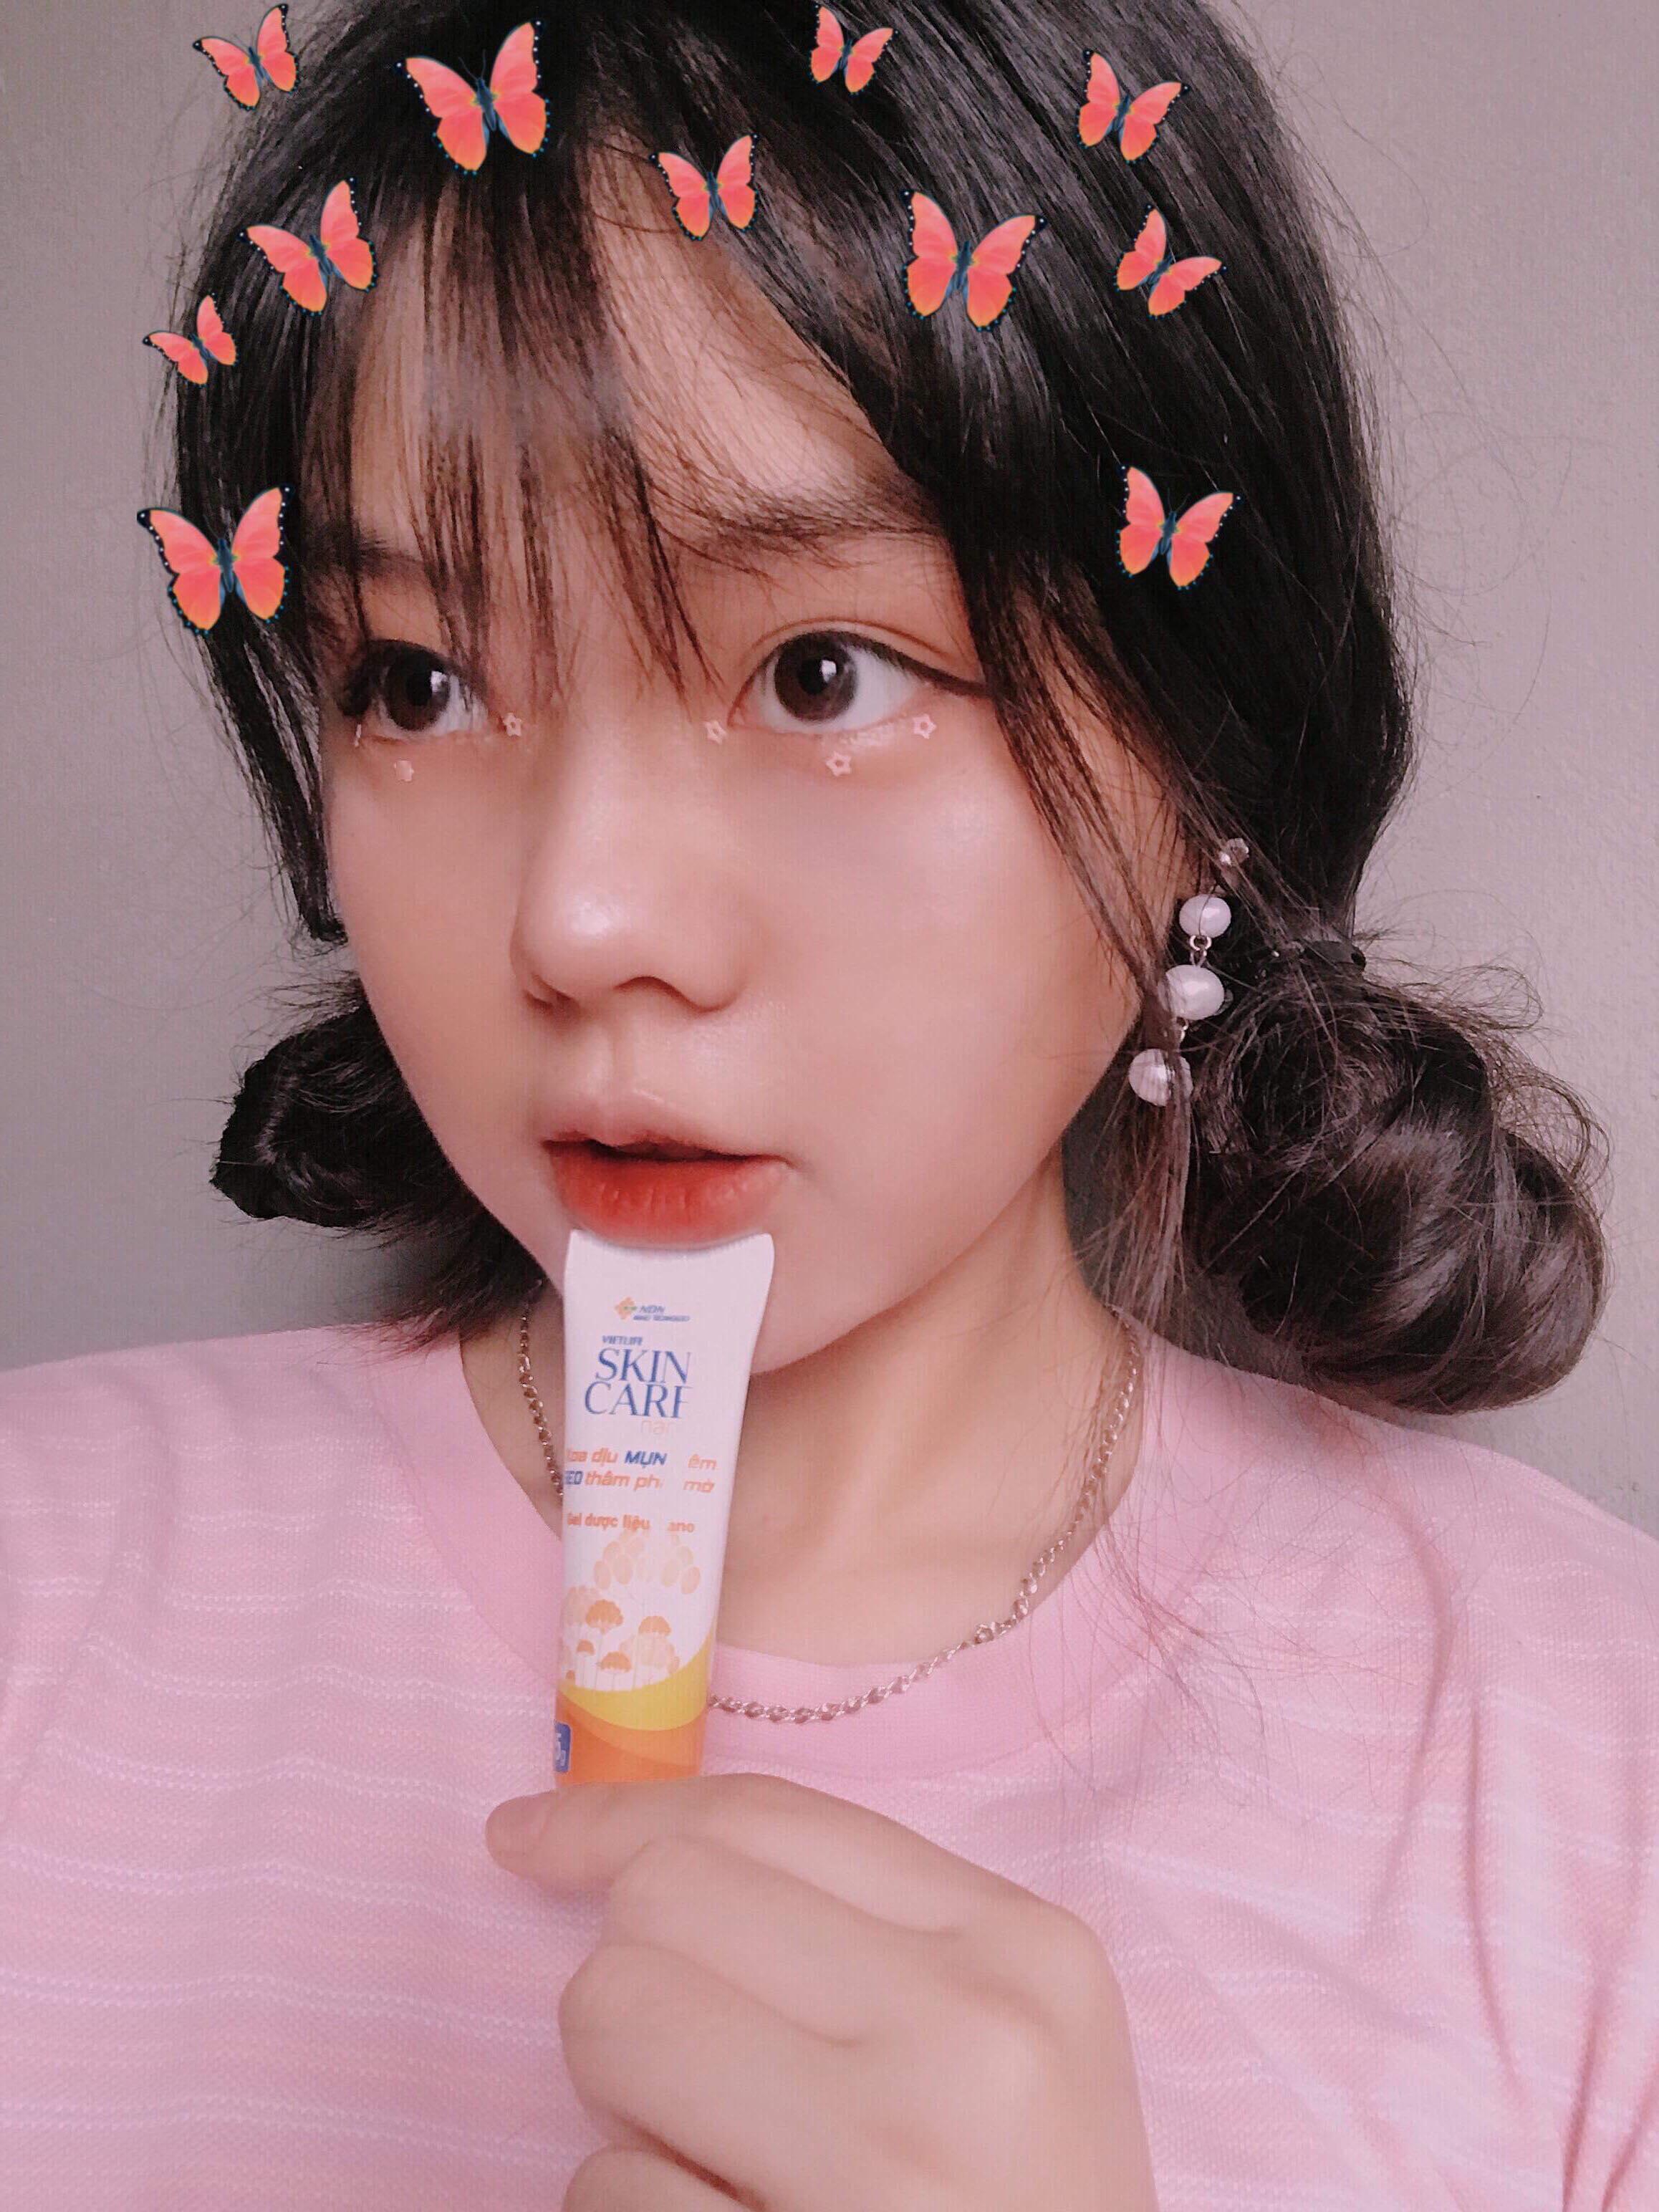 | Minigame_10/8-20/8| Tự tin gương mặt với Vietlife Skincare Nano 3